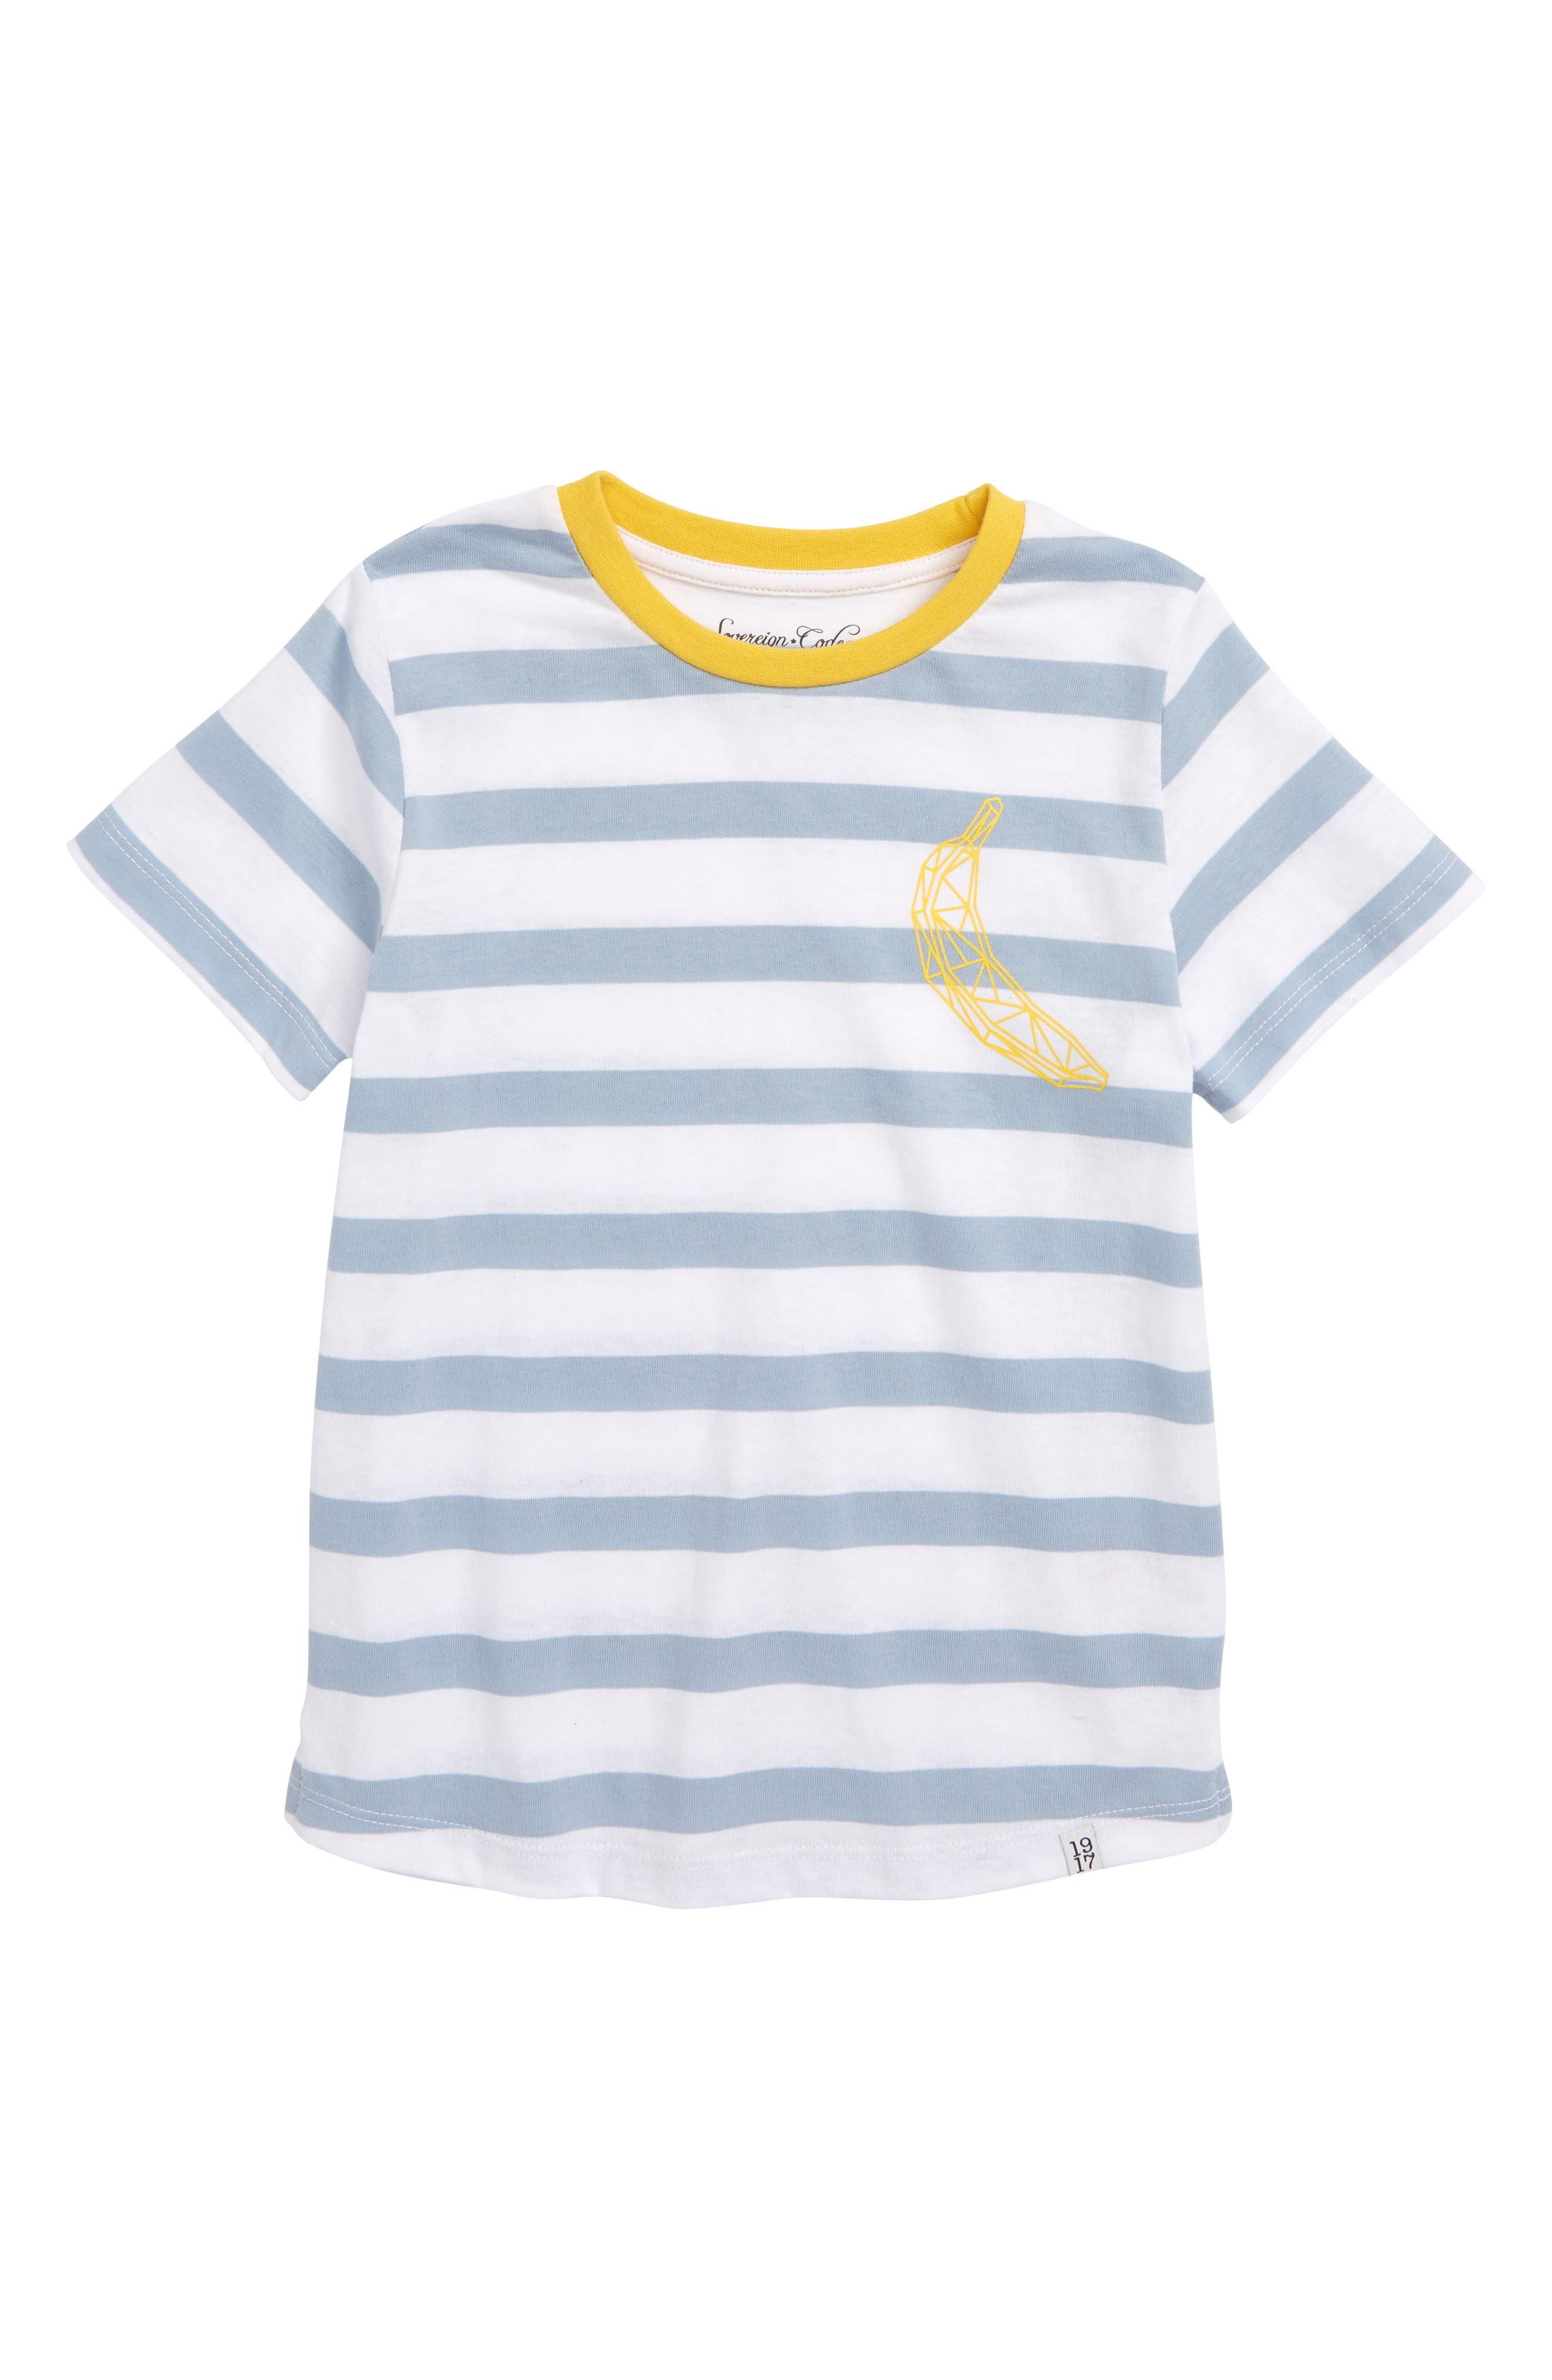 Vox Stripe T-Shirt,                             Main thumbnail 1, color,                             450